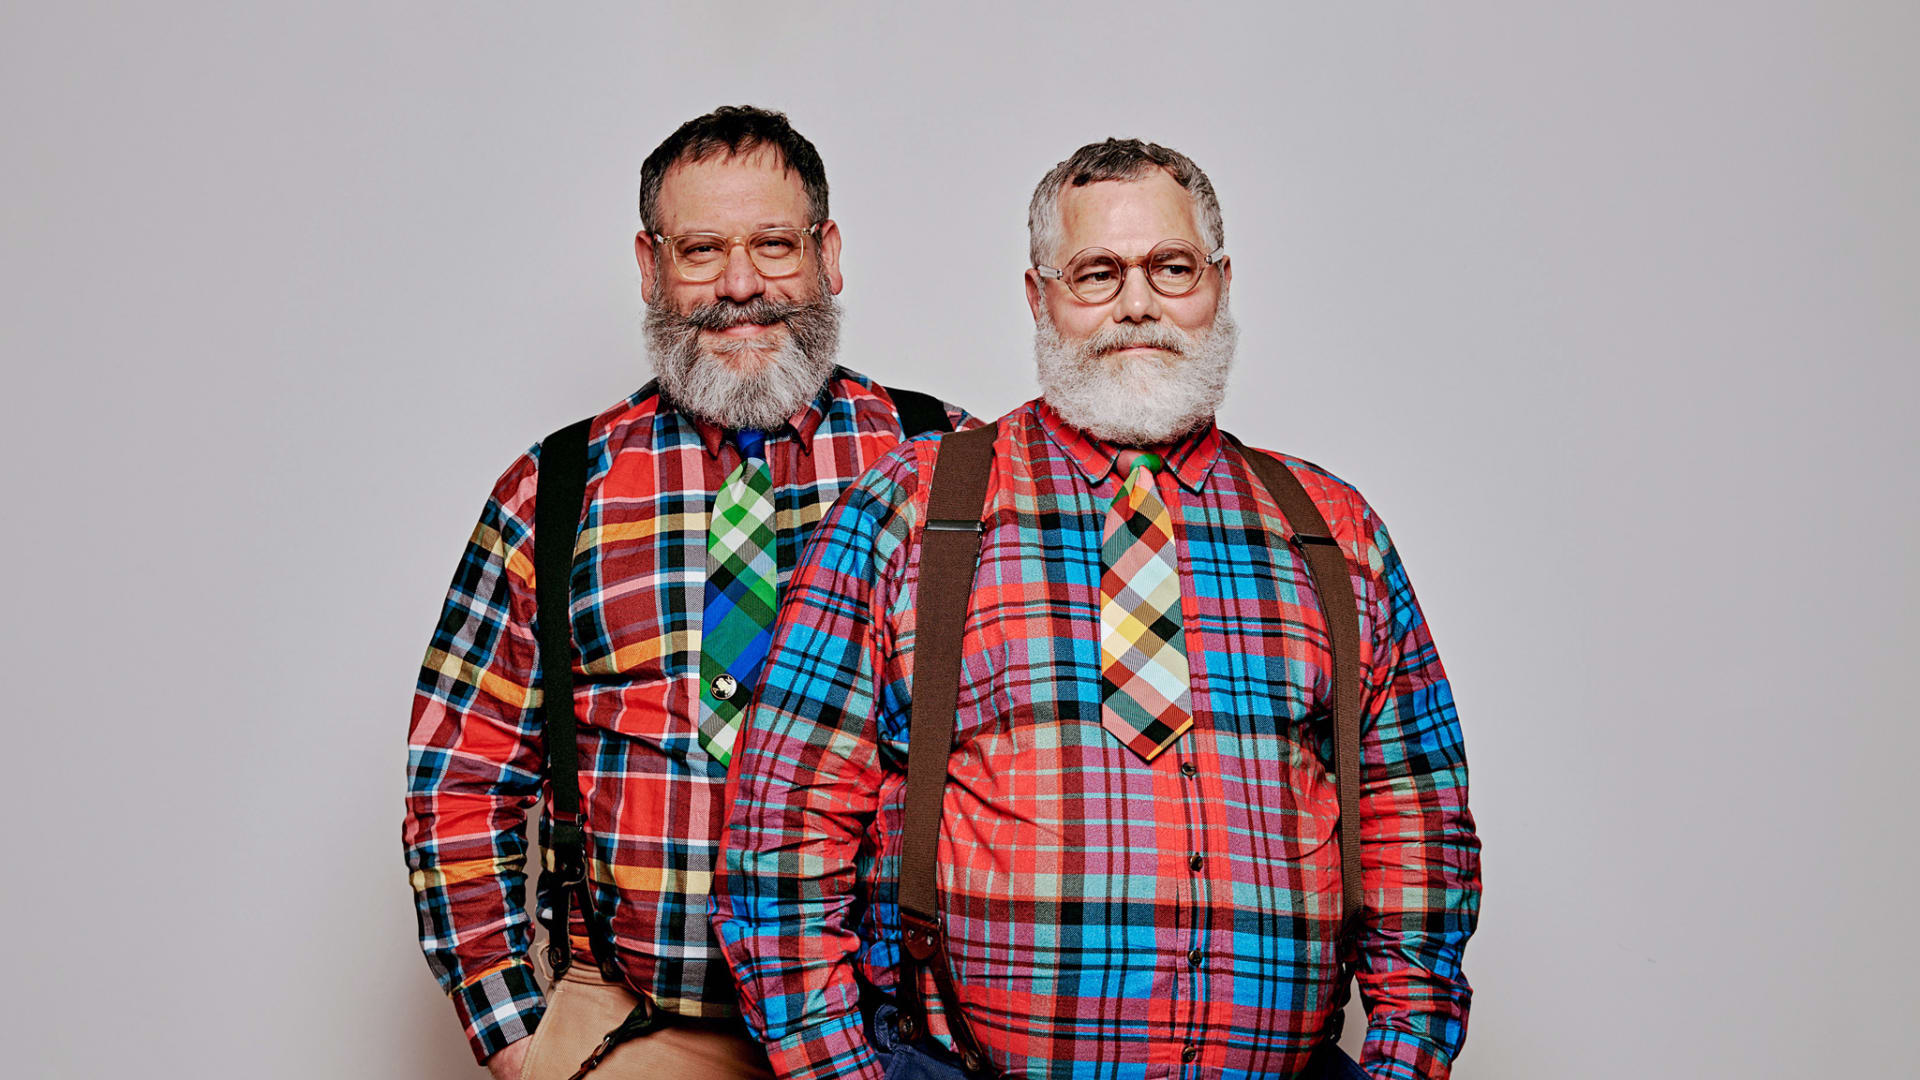 Jeffrey Costello and Robert Tagliapietra of JCRT.